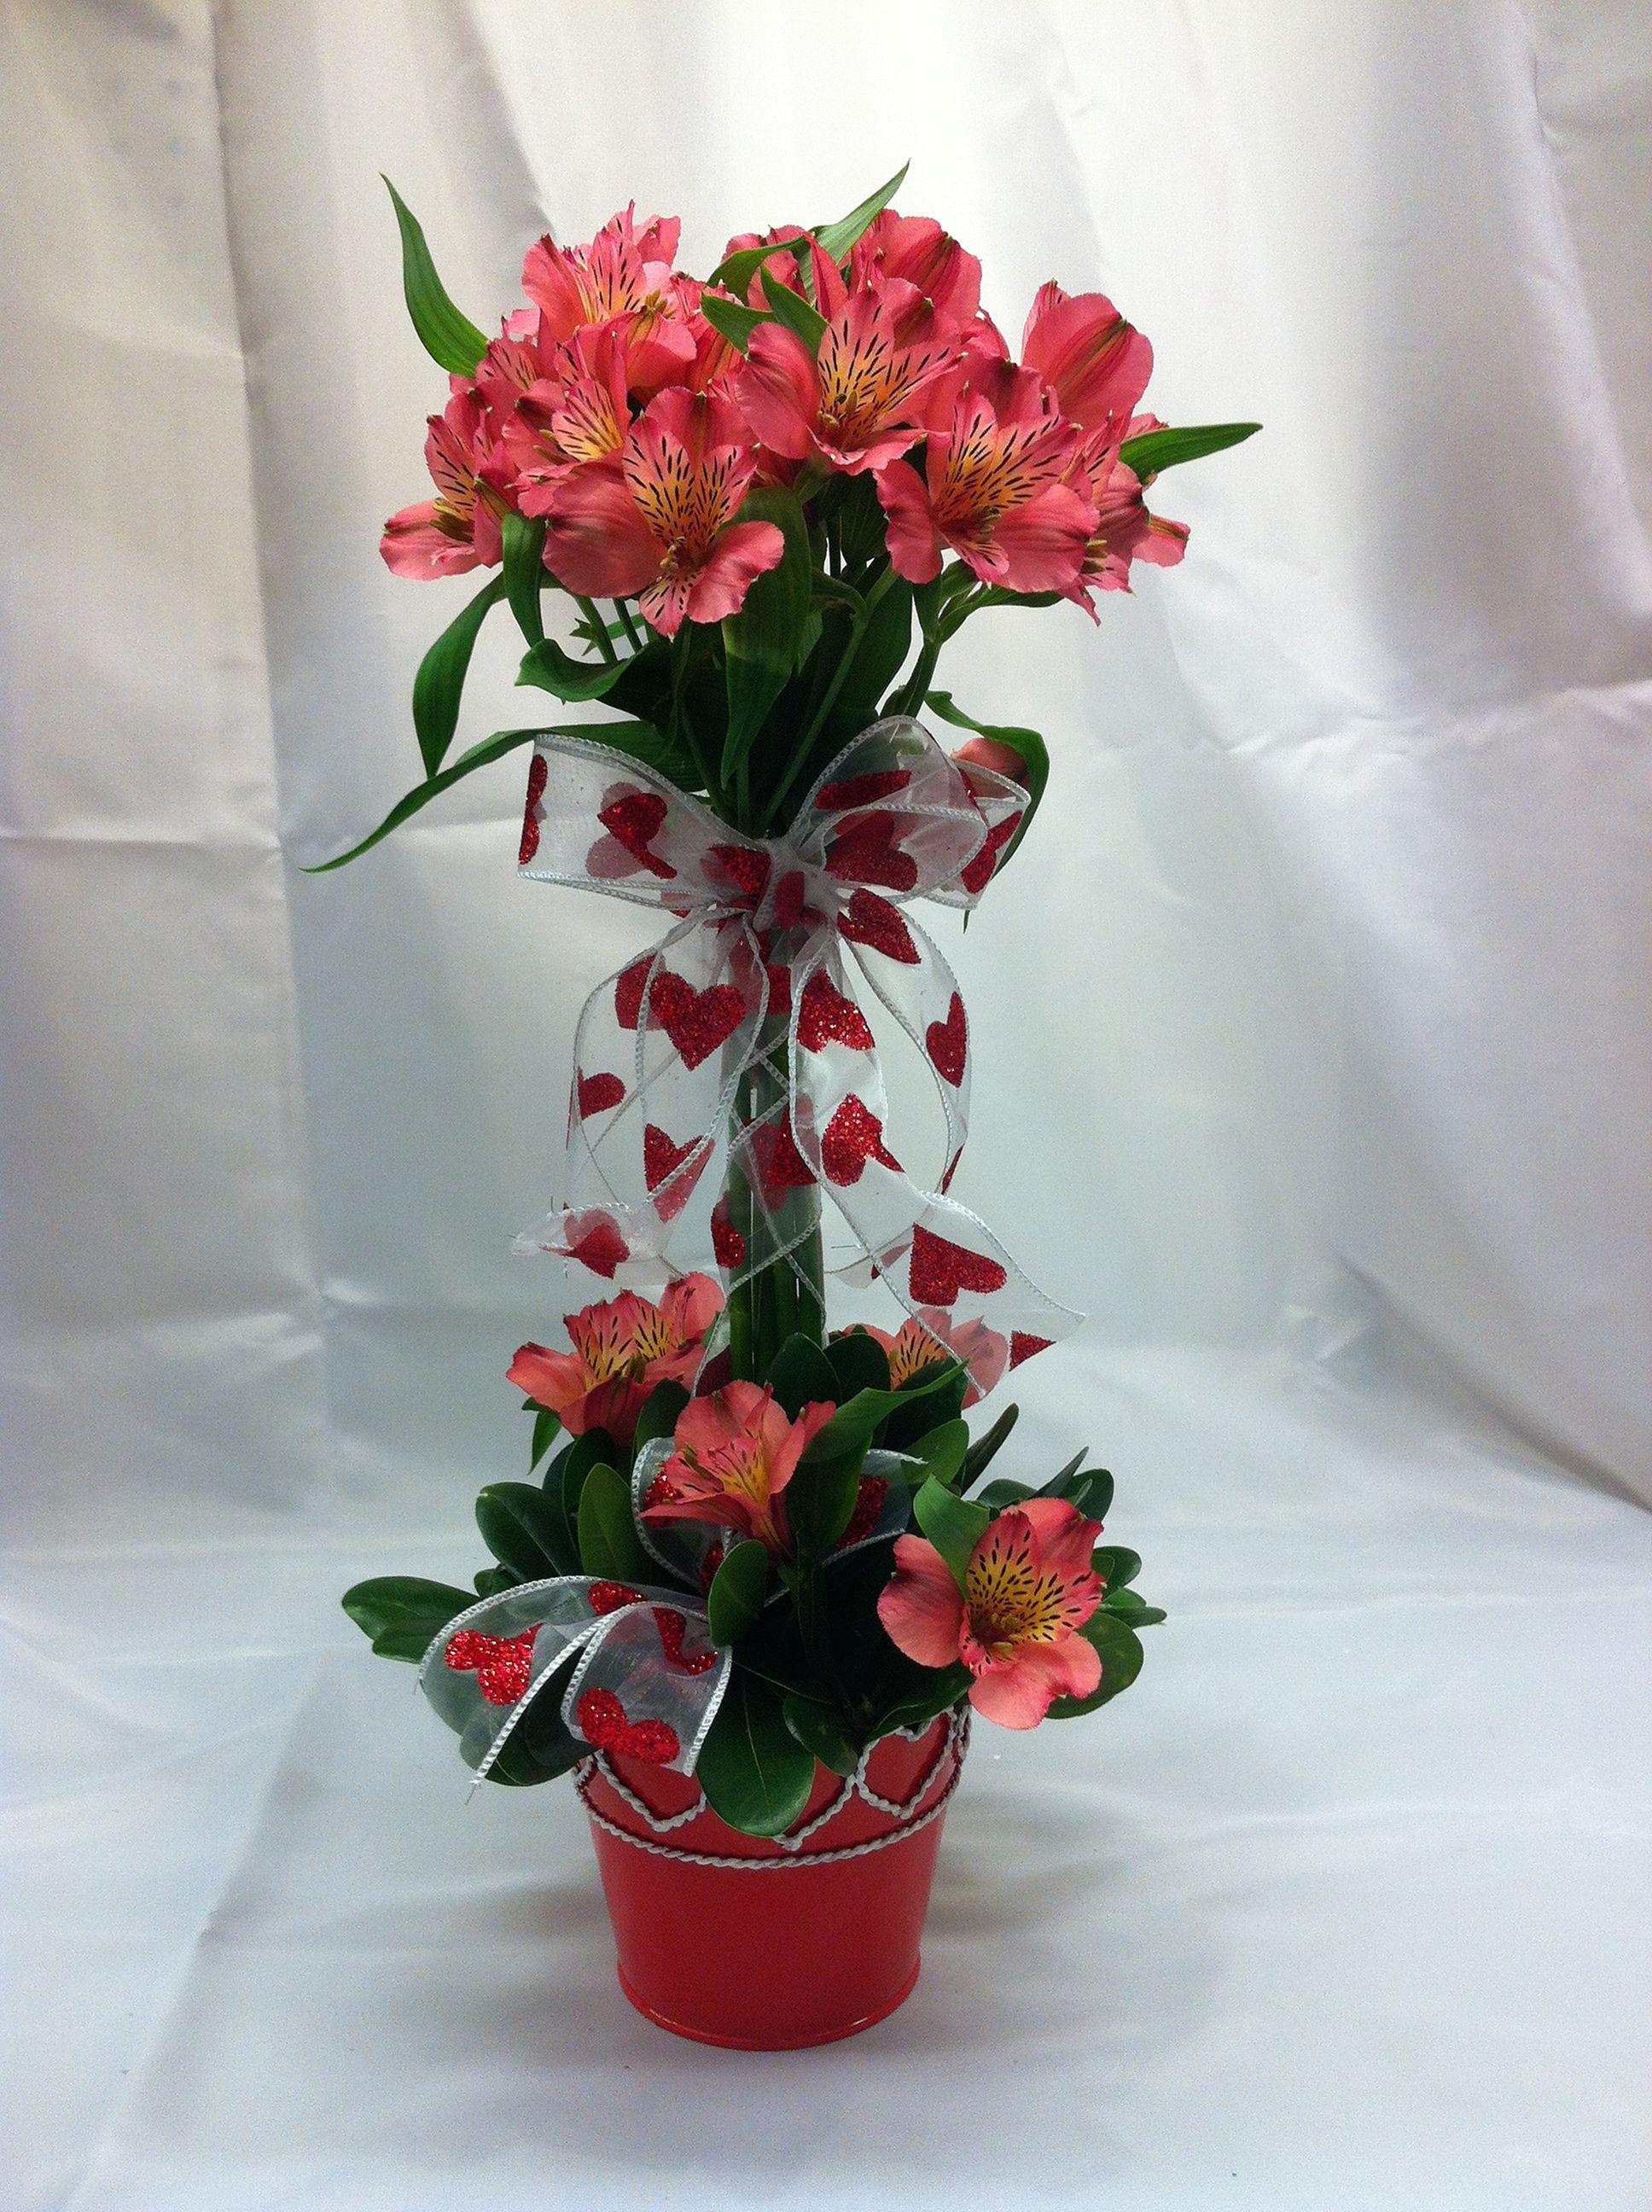 45 beautiful valentines day flower as valentines gift valentines flower wicked 45 beautiful valentines izmirmasajfo